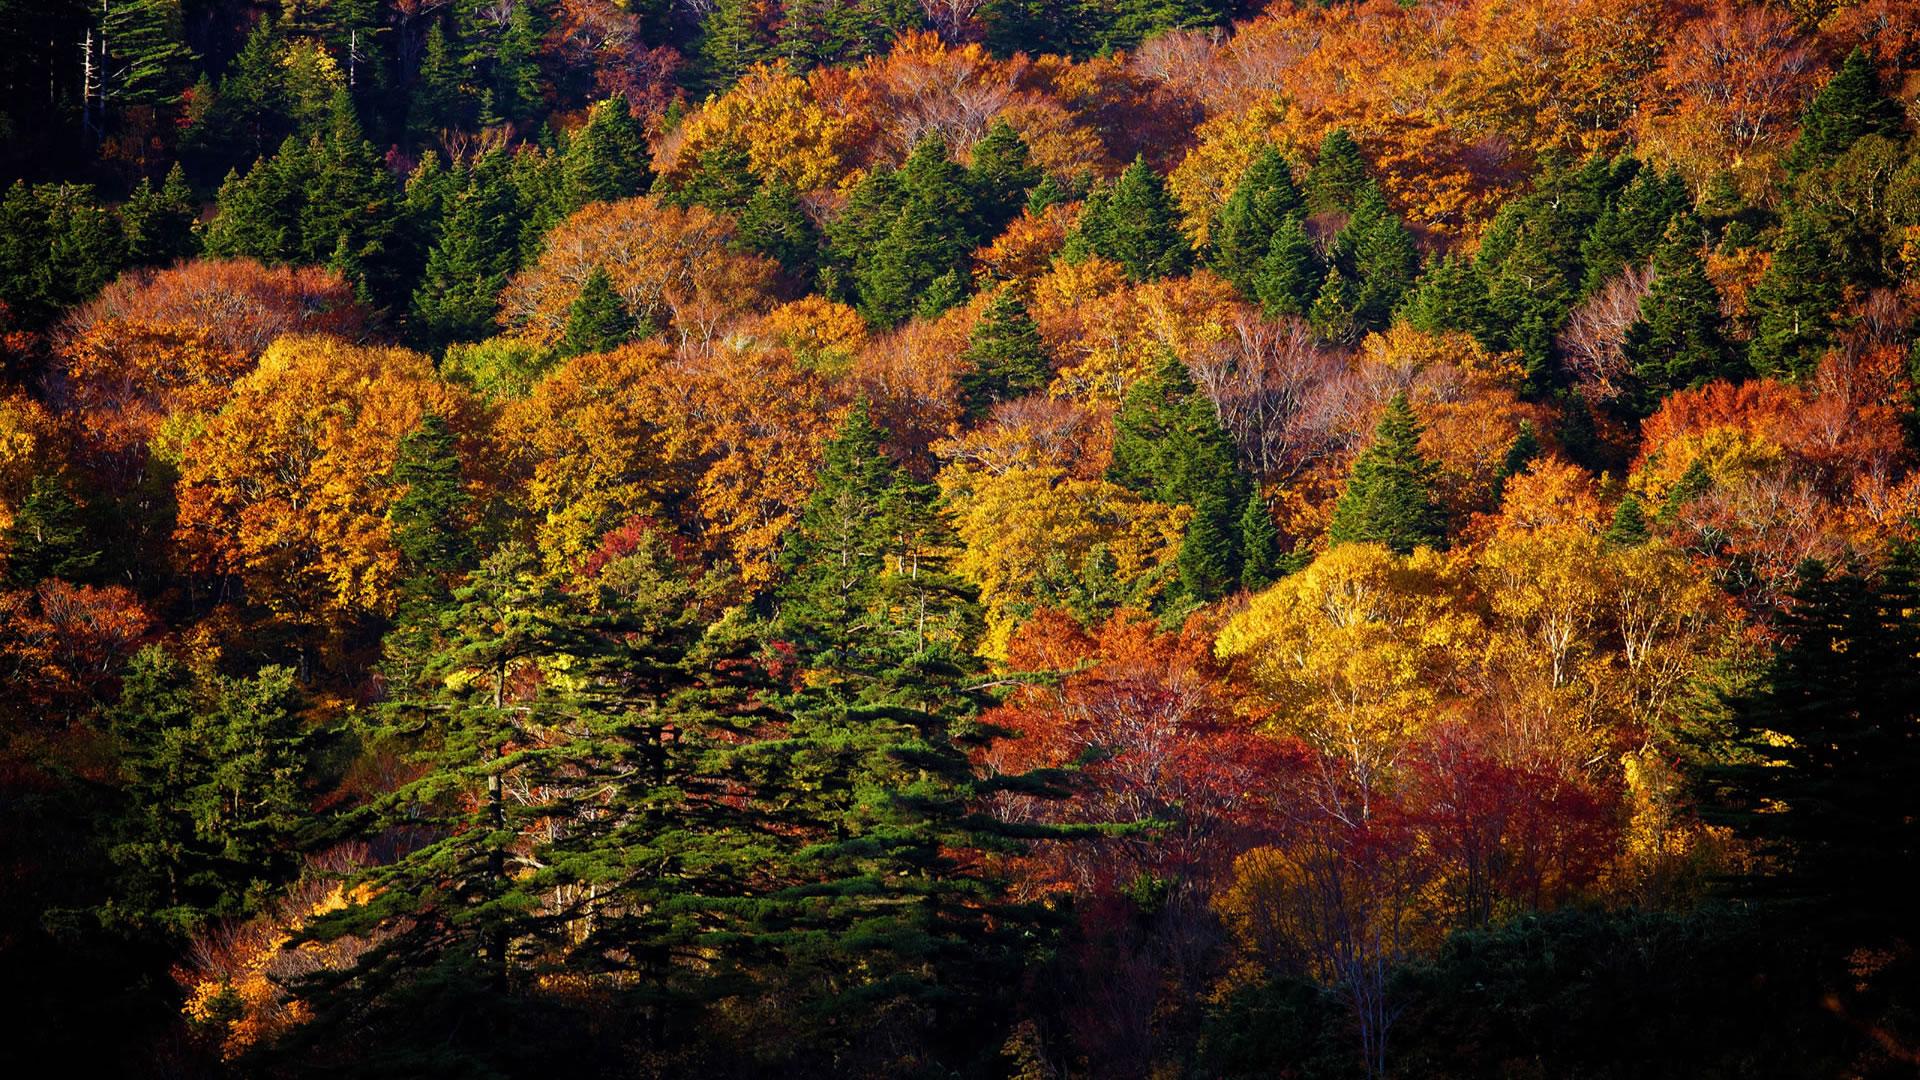 fall colors wallpaper desktop With Resolutions 1920×1080 Pixel